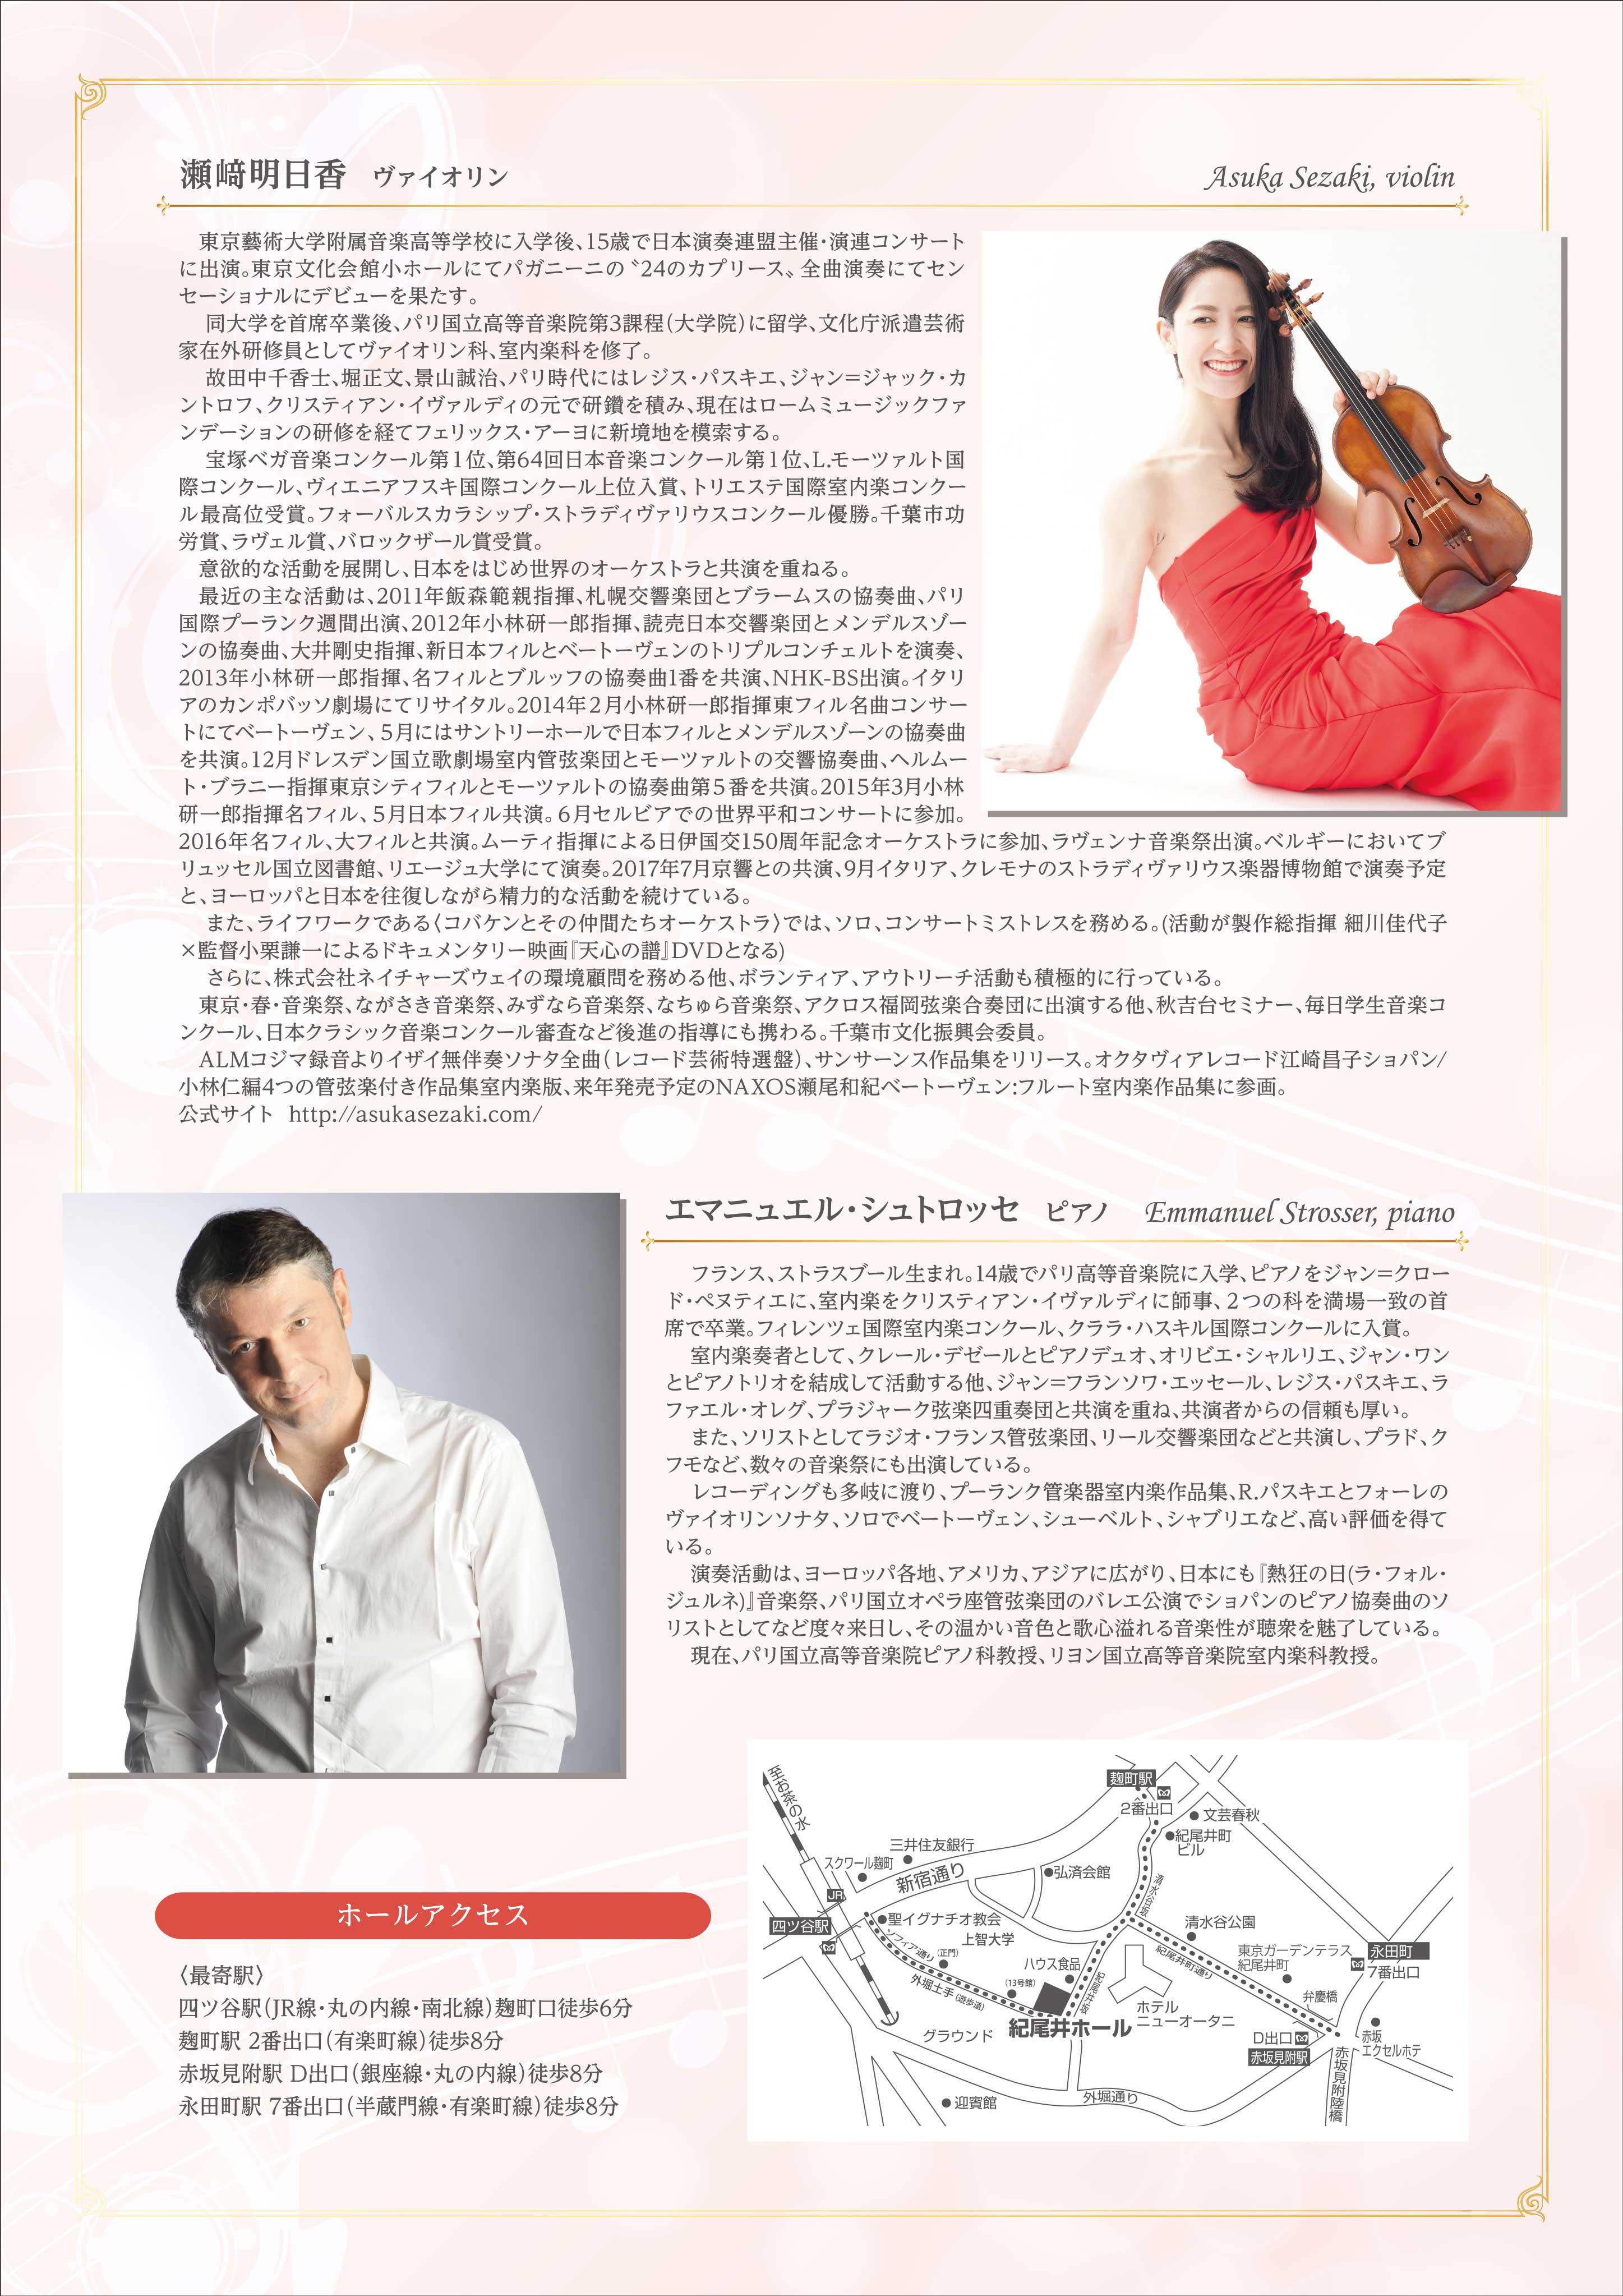 LE118_sezakiasuka_violin_recital_ura_A4_06ol